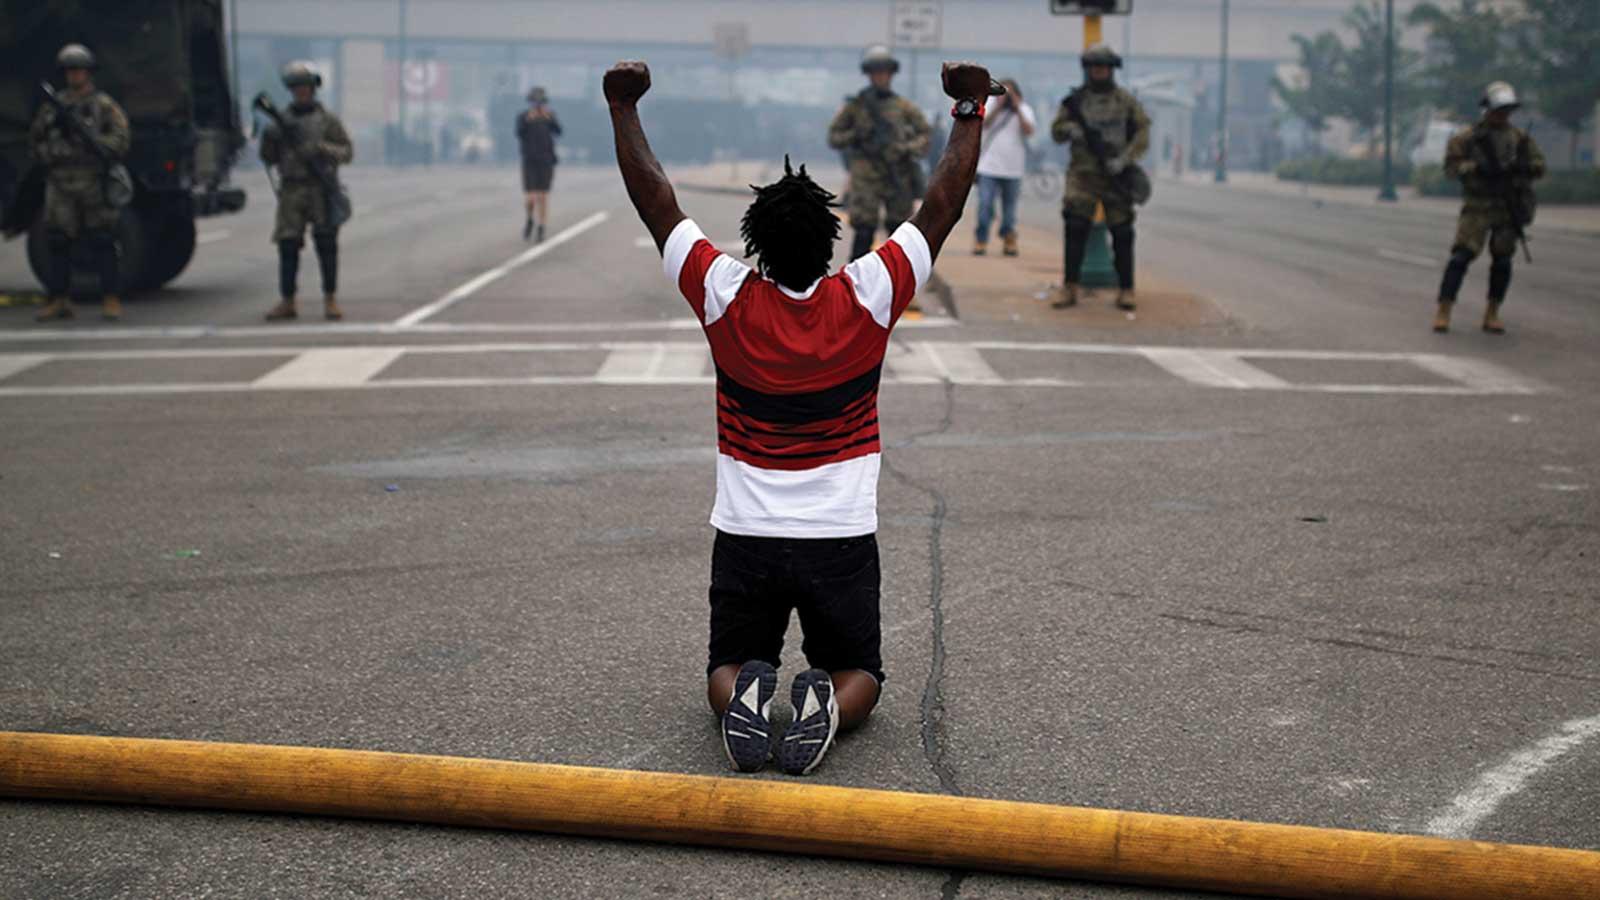 Black man kneels with his fists raised